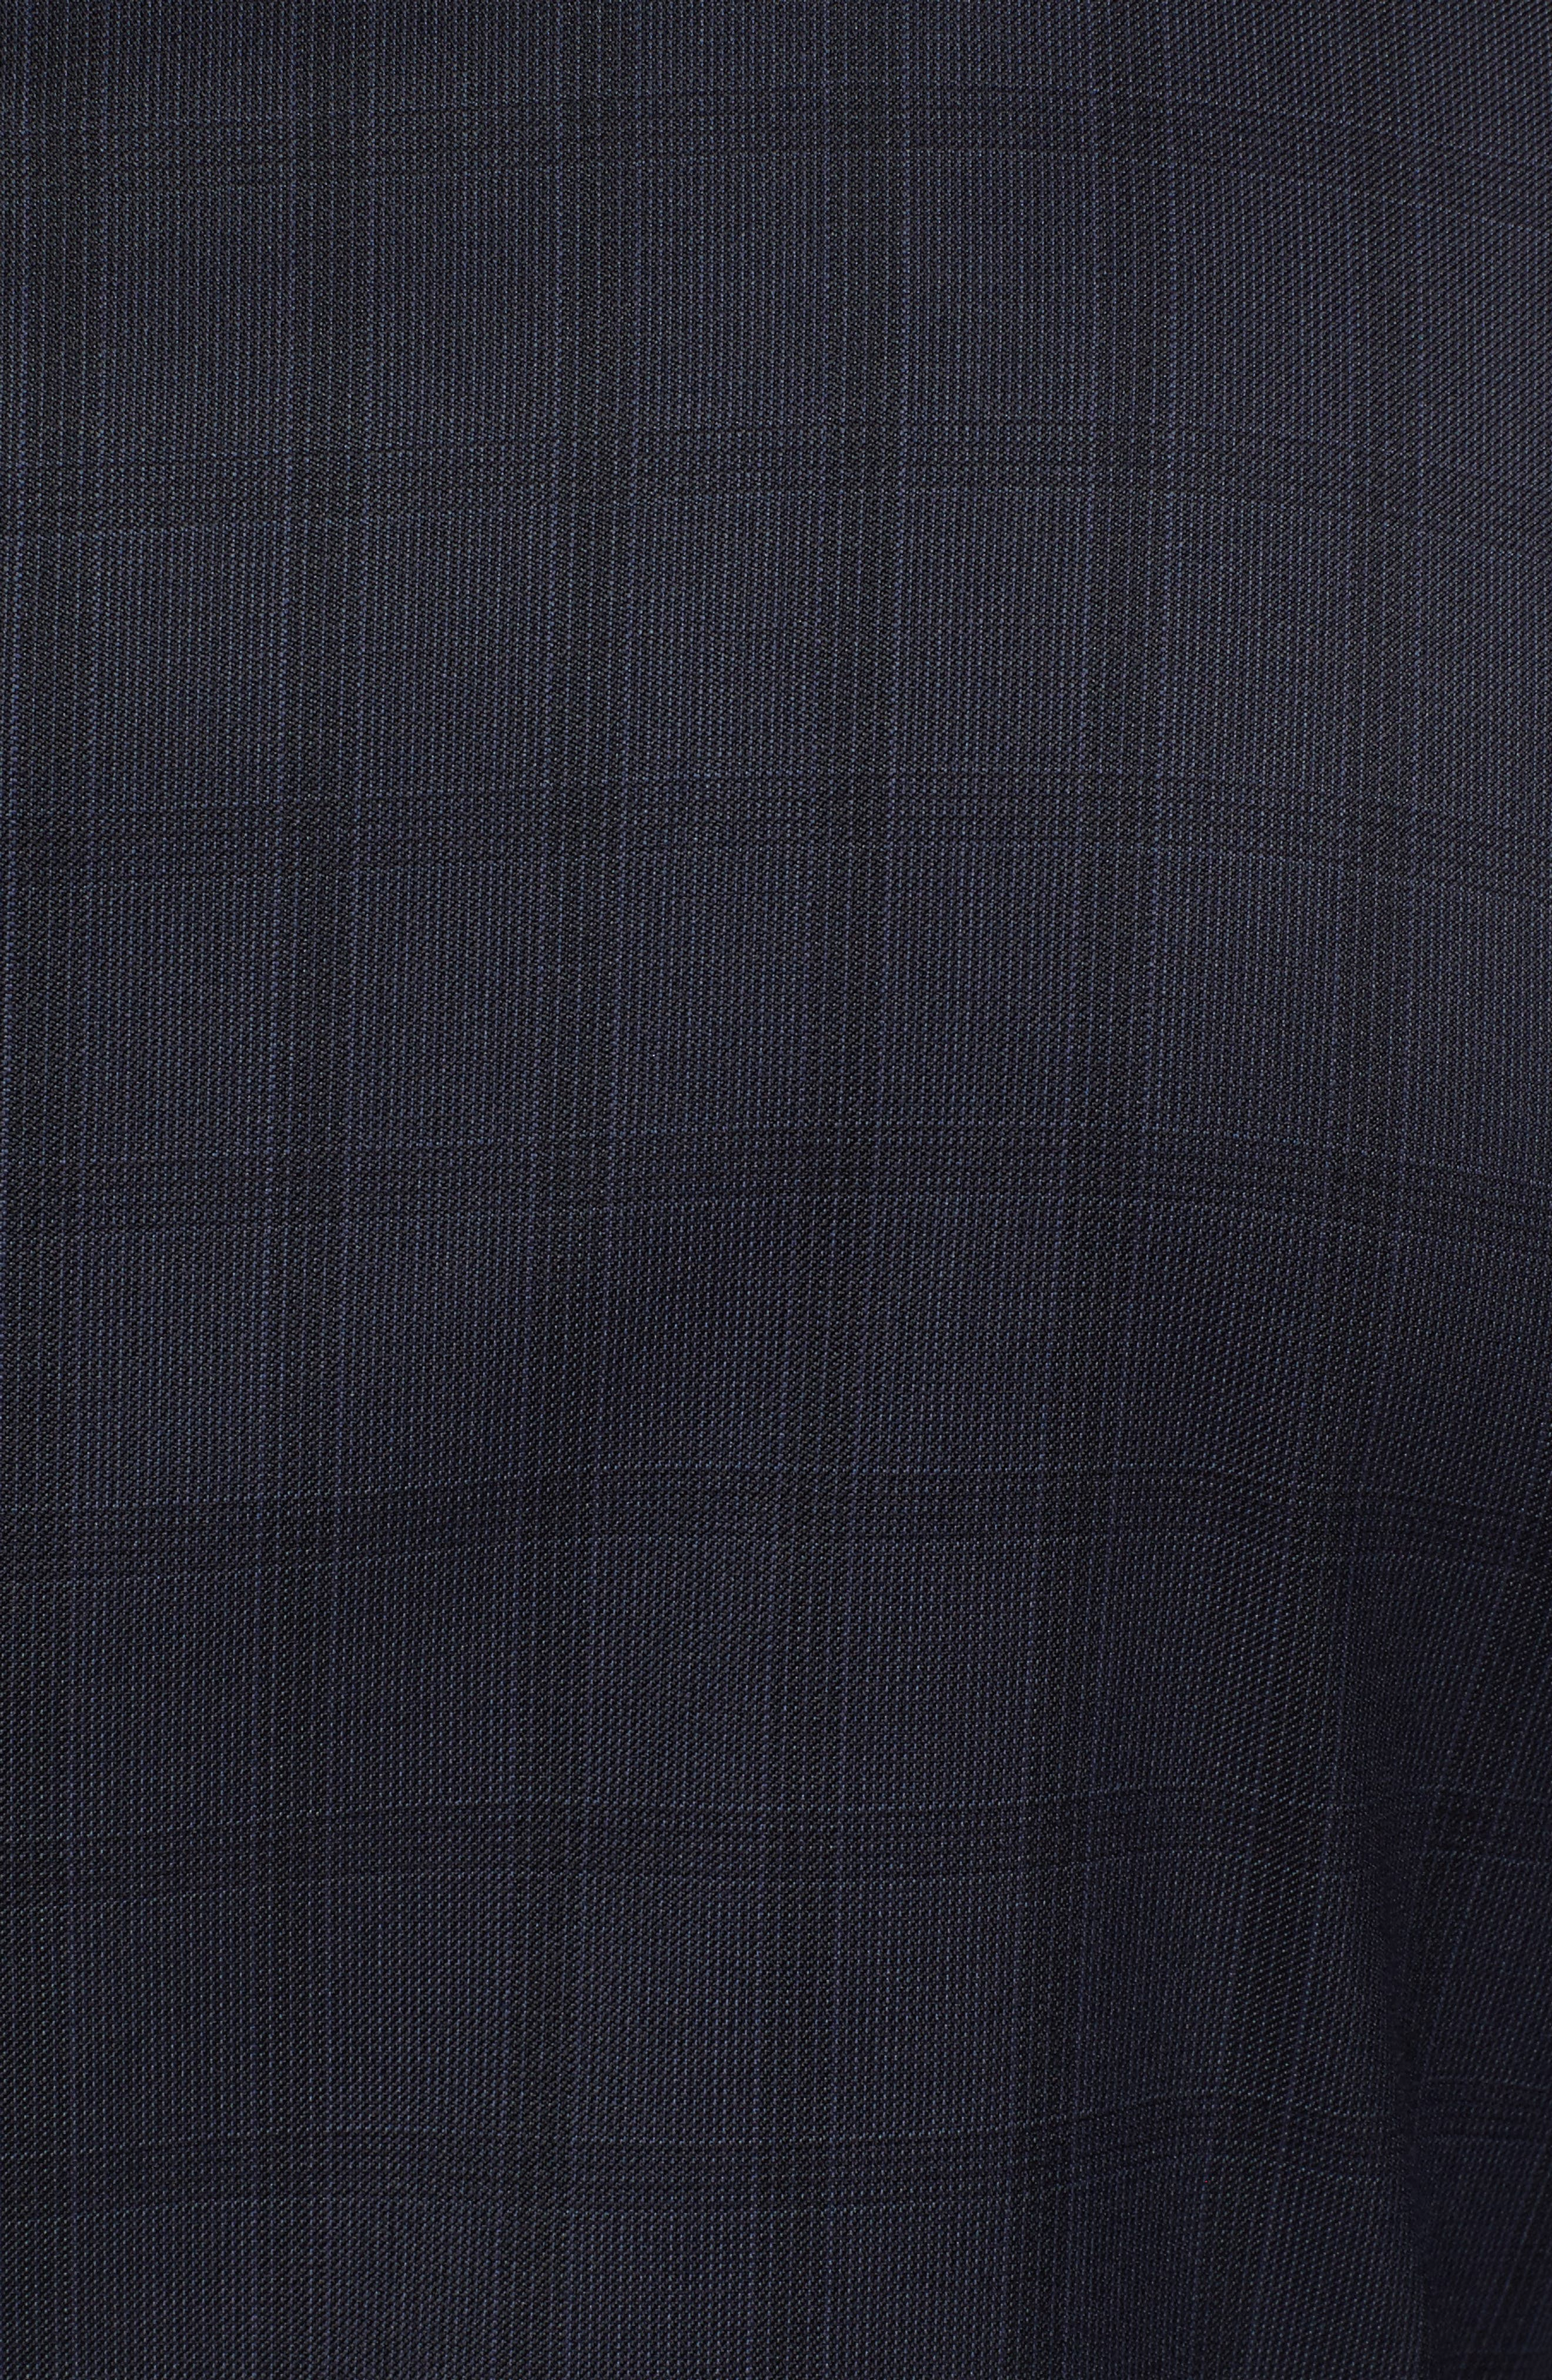 Jay Trim Fit Check Wool Suit,                             Alternate thumbnail 7, color,                             410